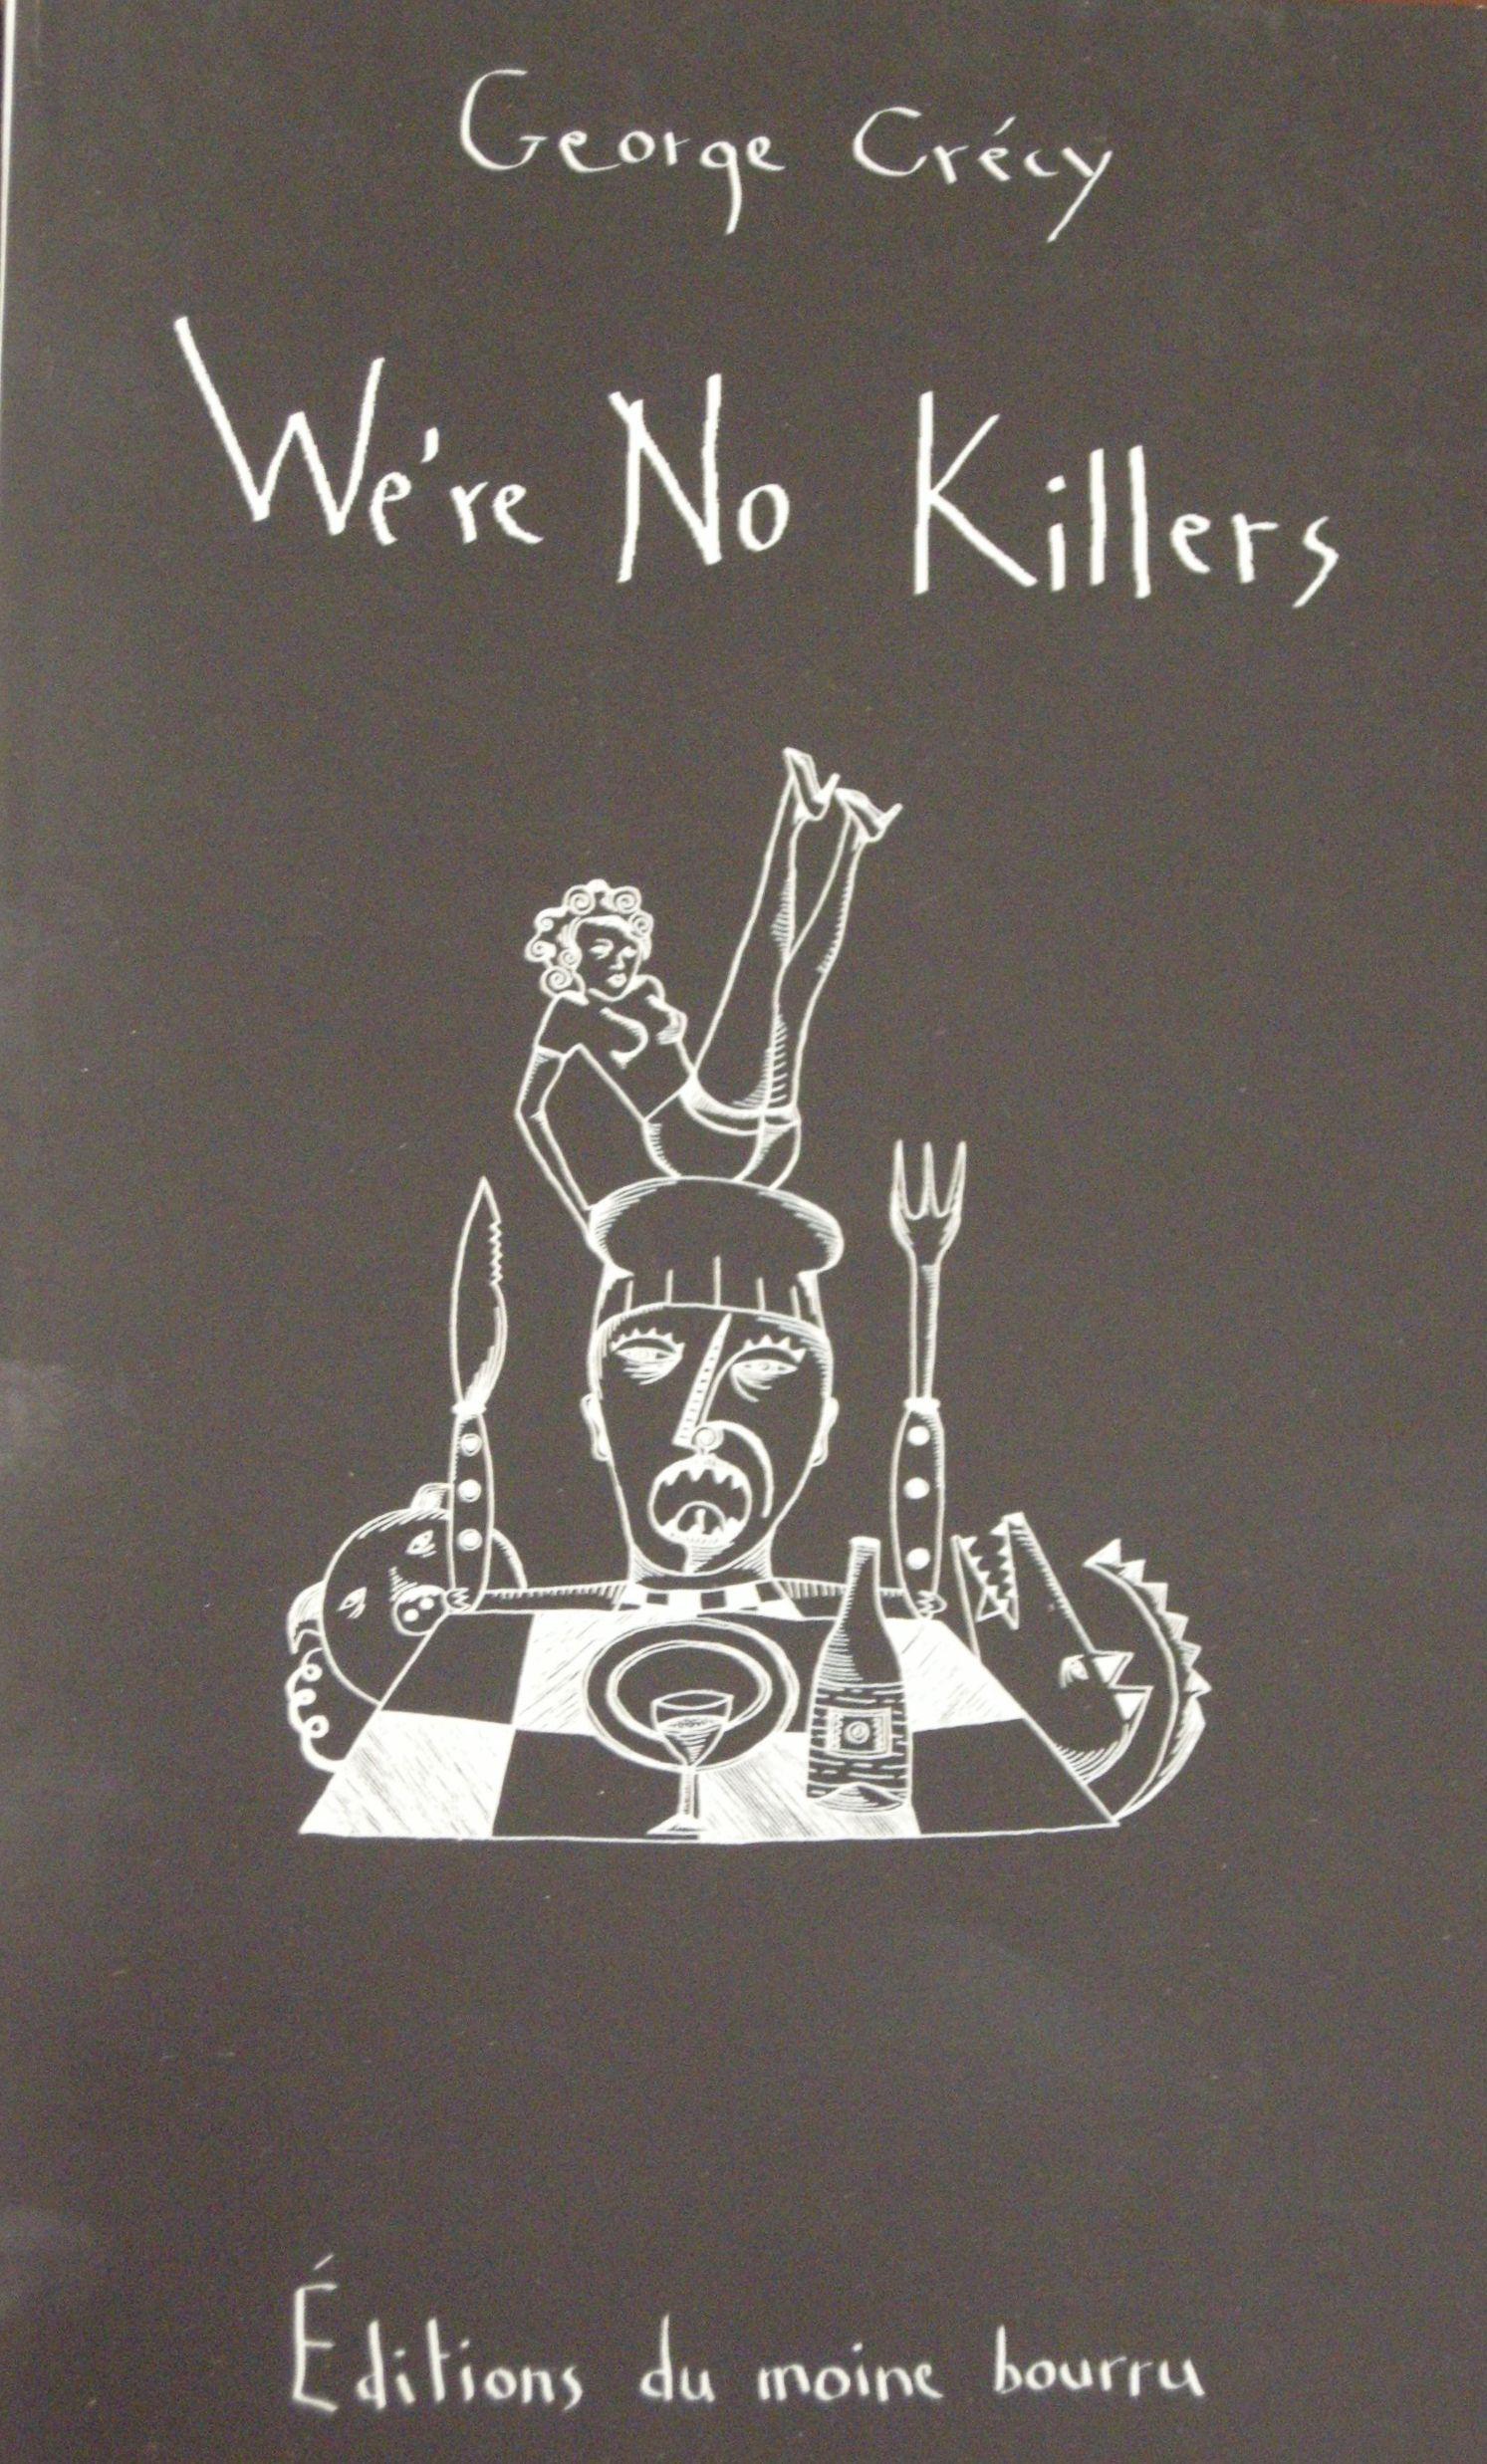 We're No Killers